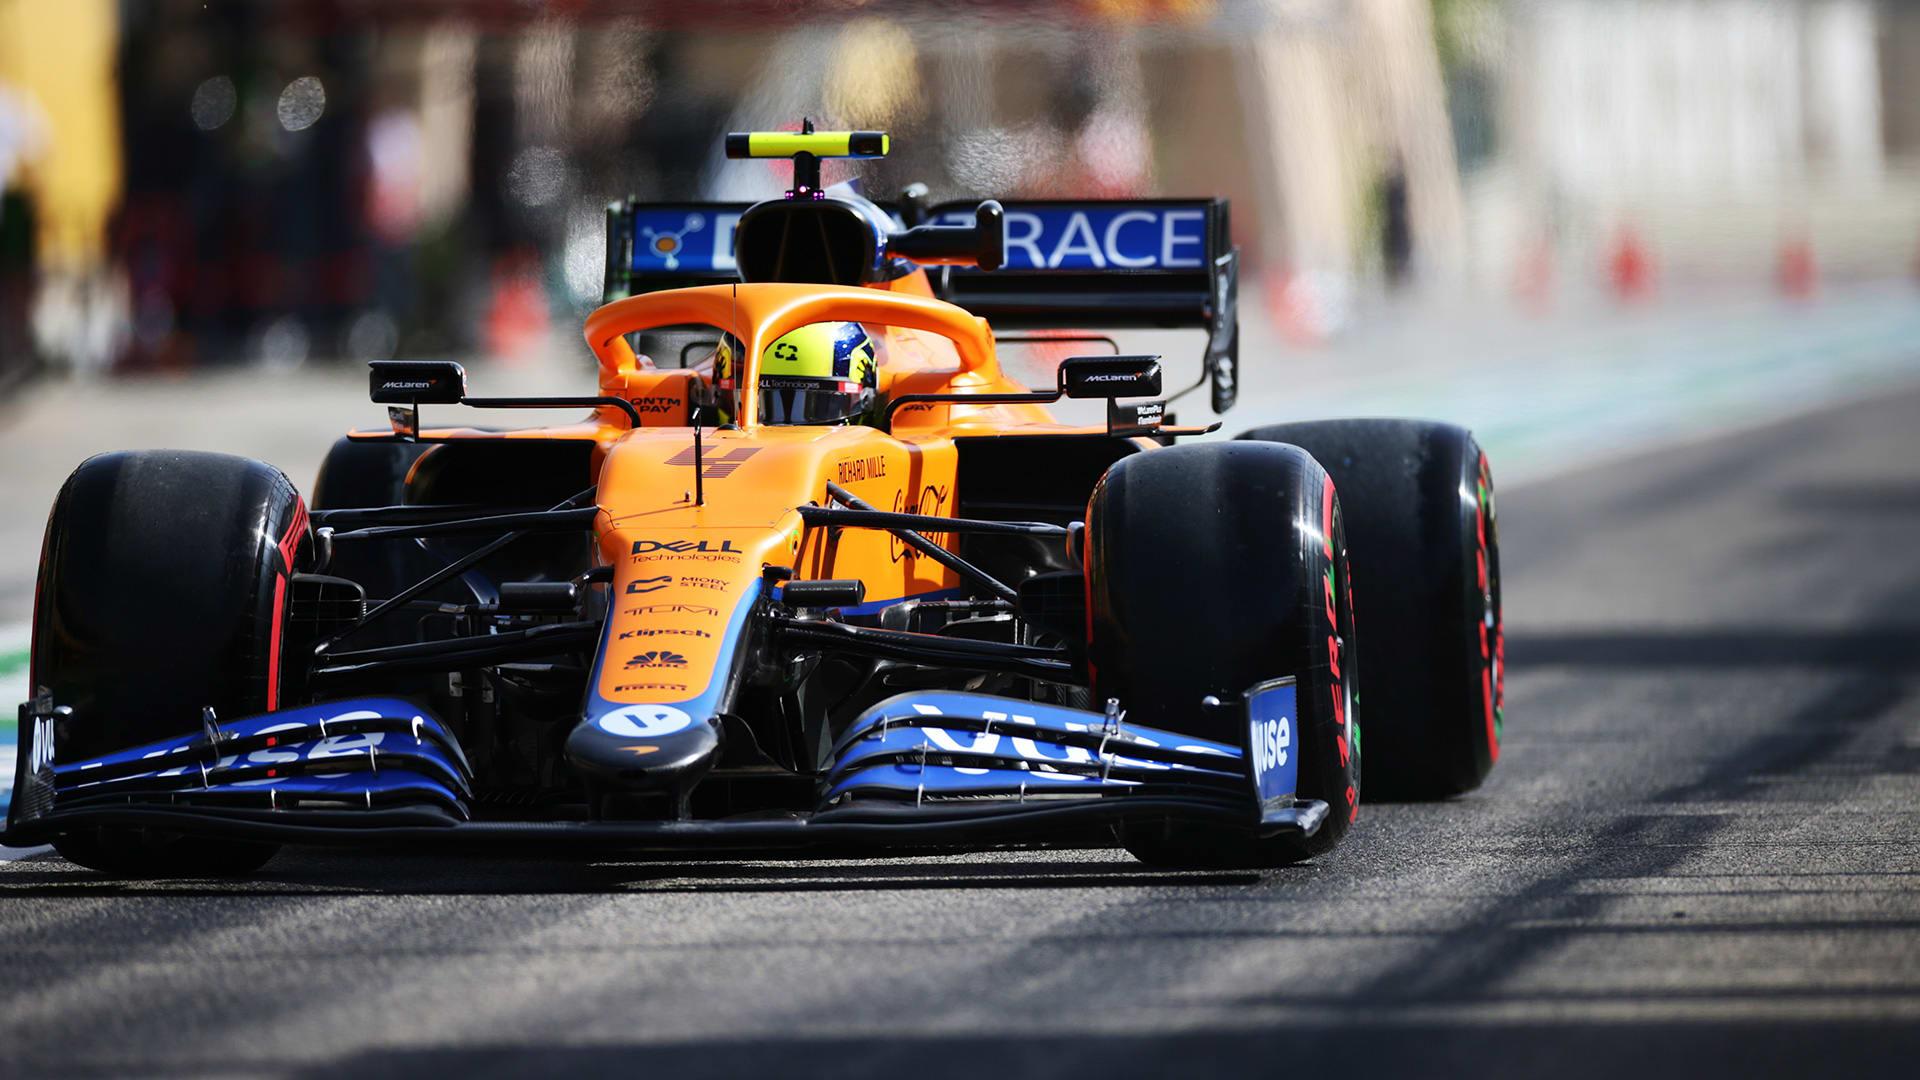 McLaren gatecrashing Mercedes-Red Bull fight 'unrealistic' in 2021, says Brown - Formula 1 RSS UK